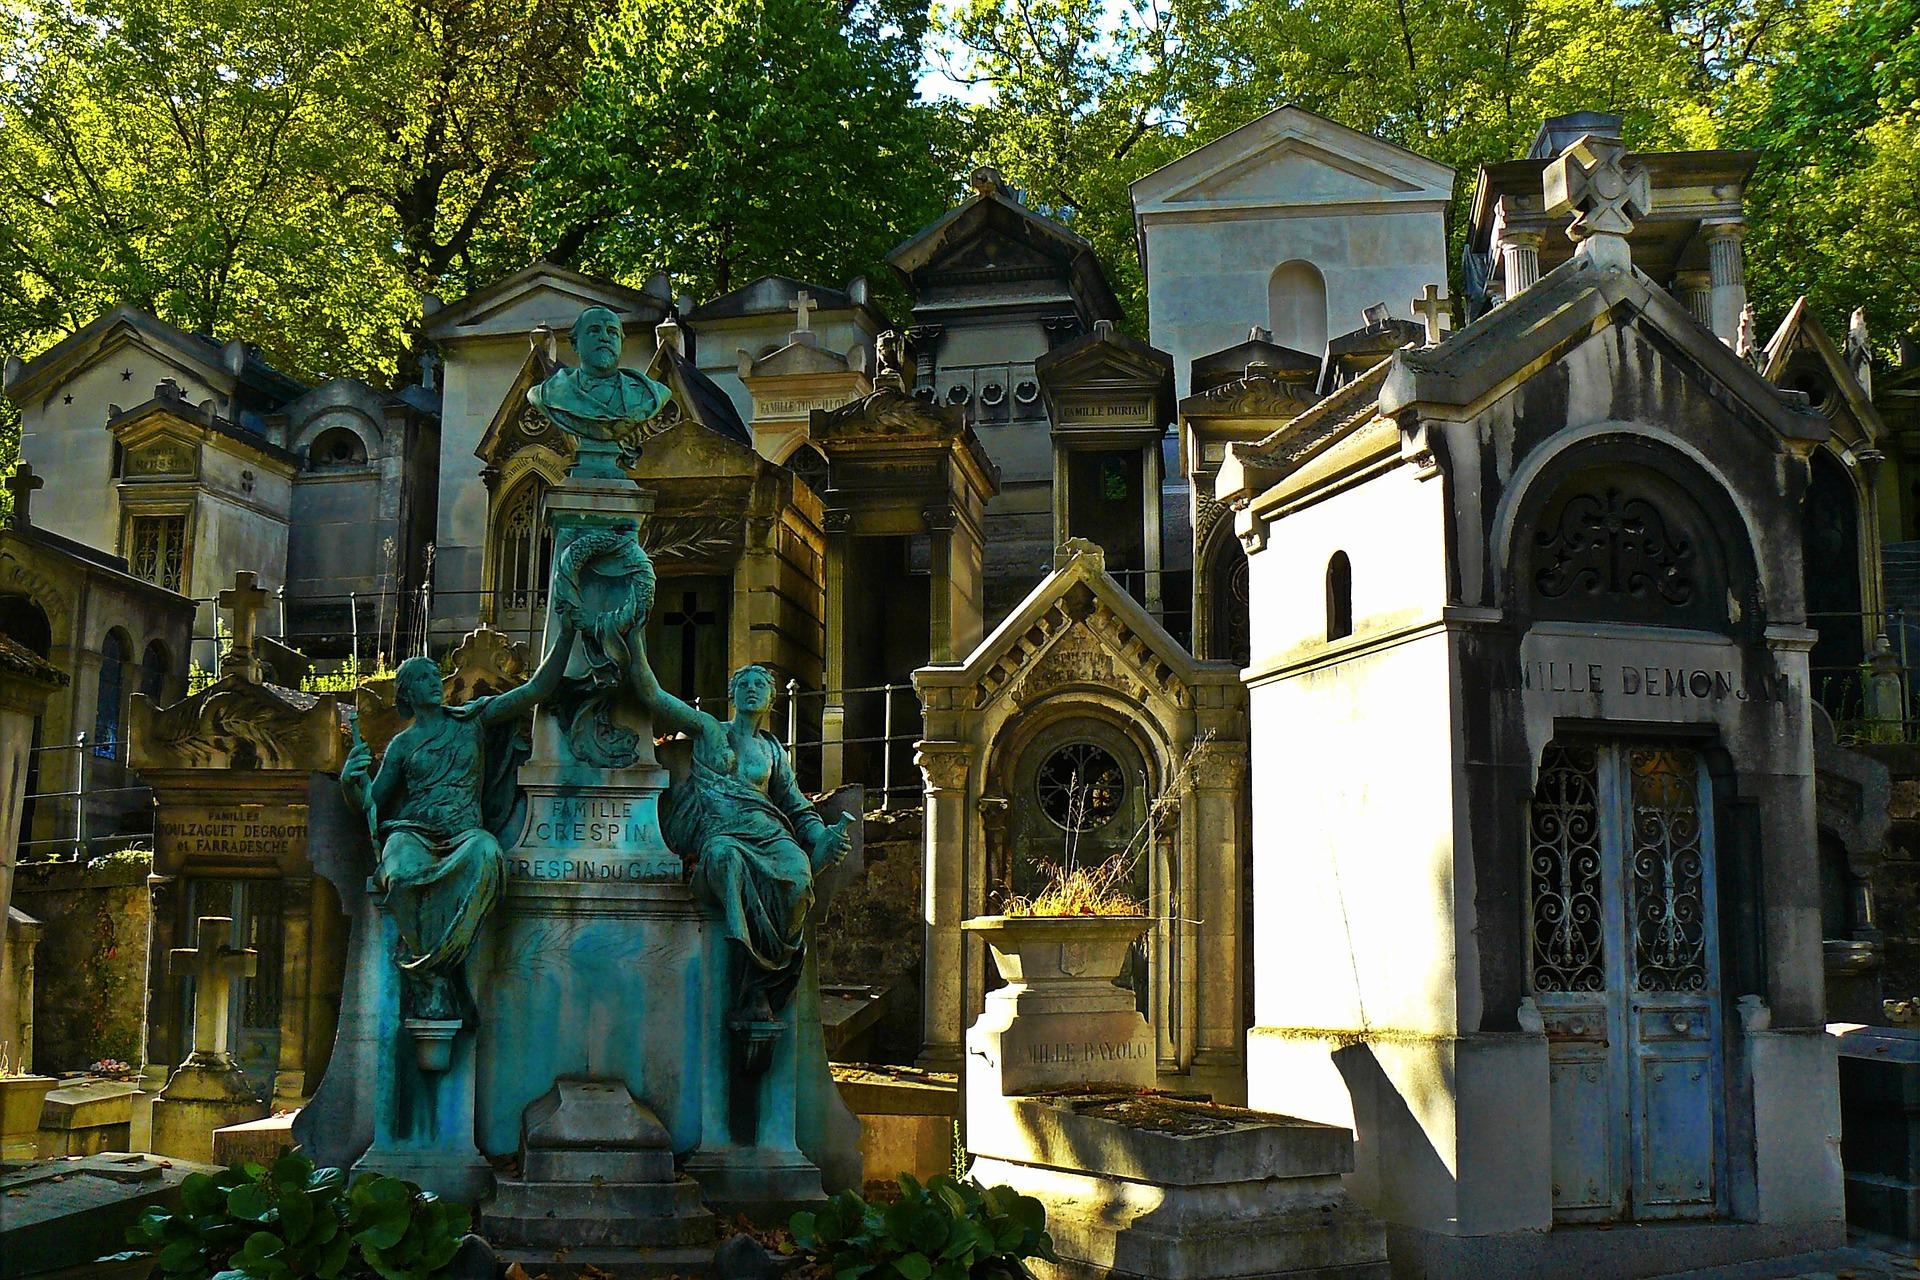 Graveyard, Cemetry, Grave, HQ Photo